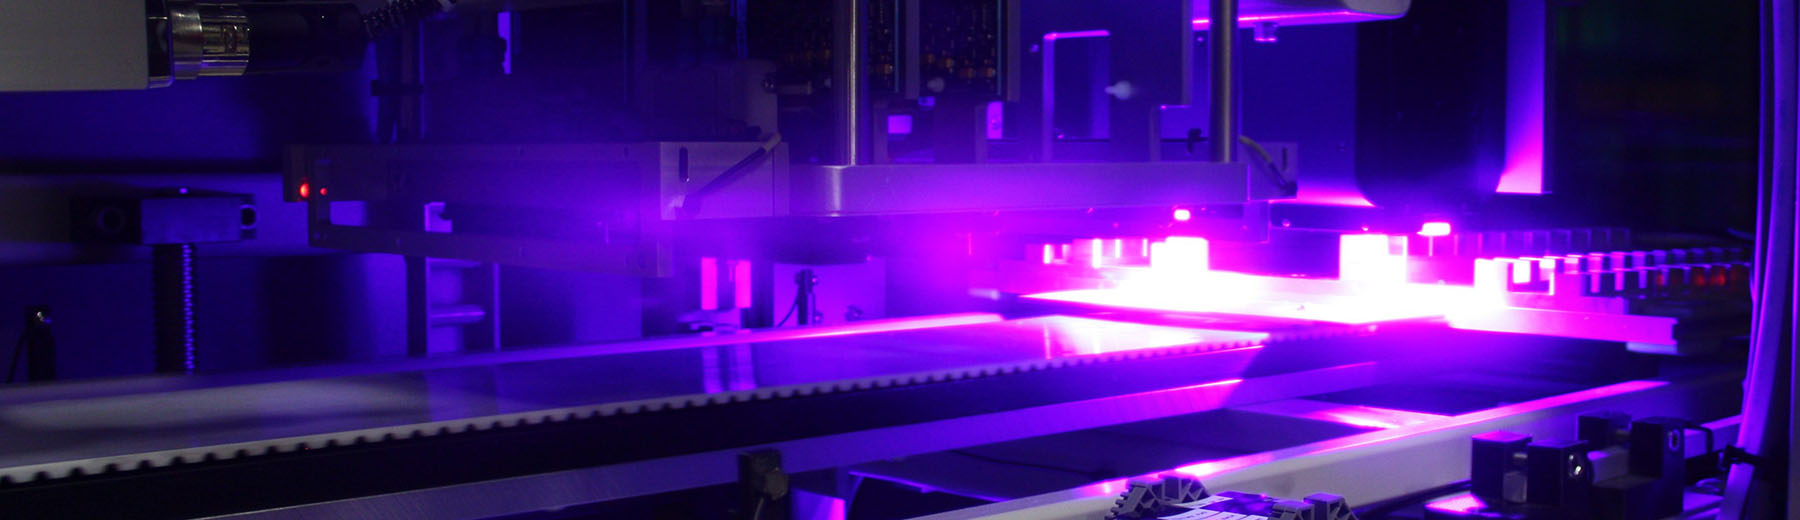 Engineered Printing Solutions